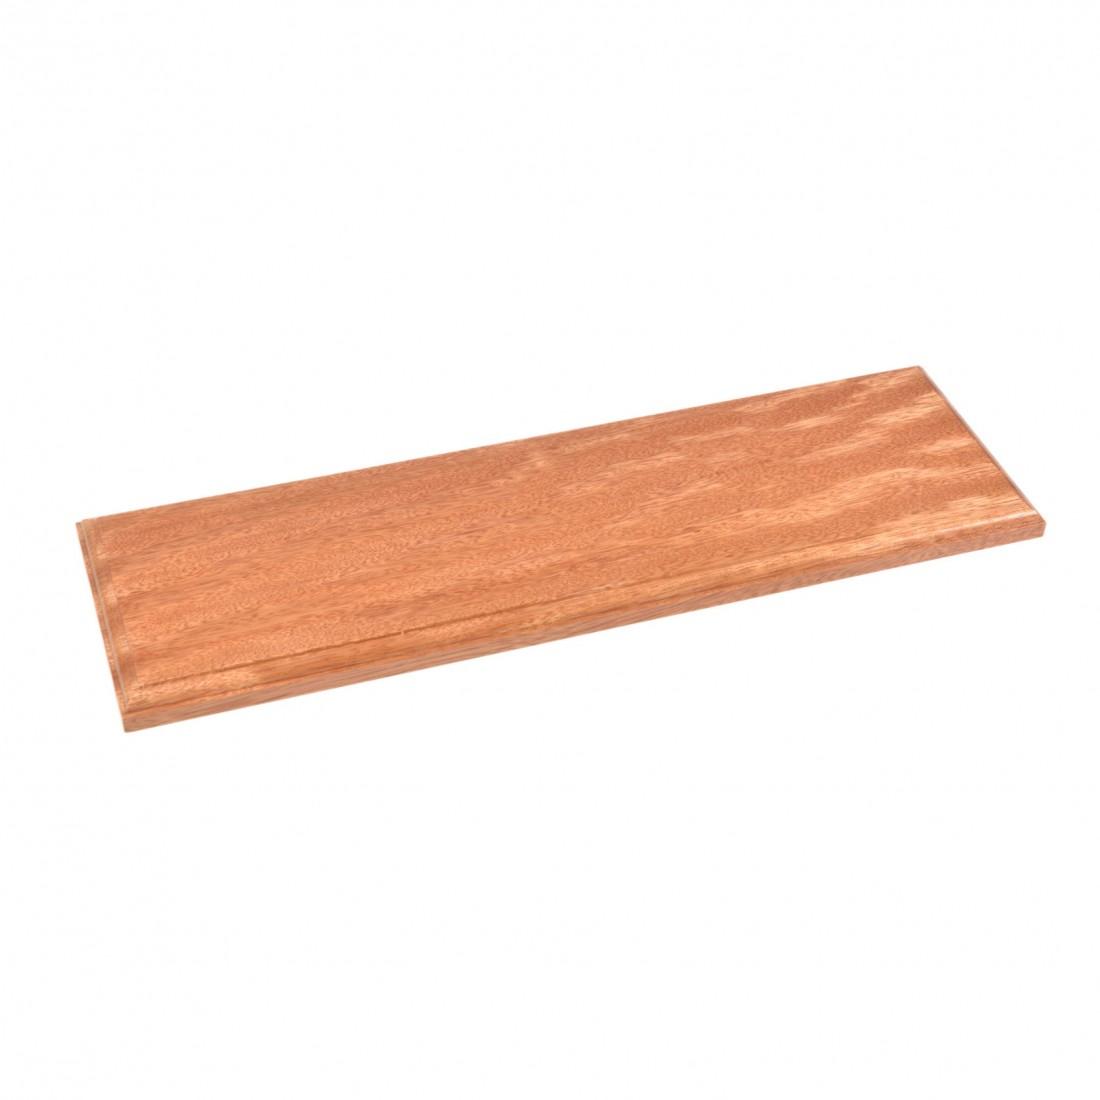 Basamenti legno verniciati cm.50x15x2